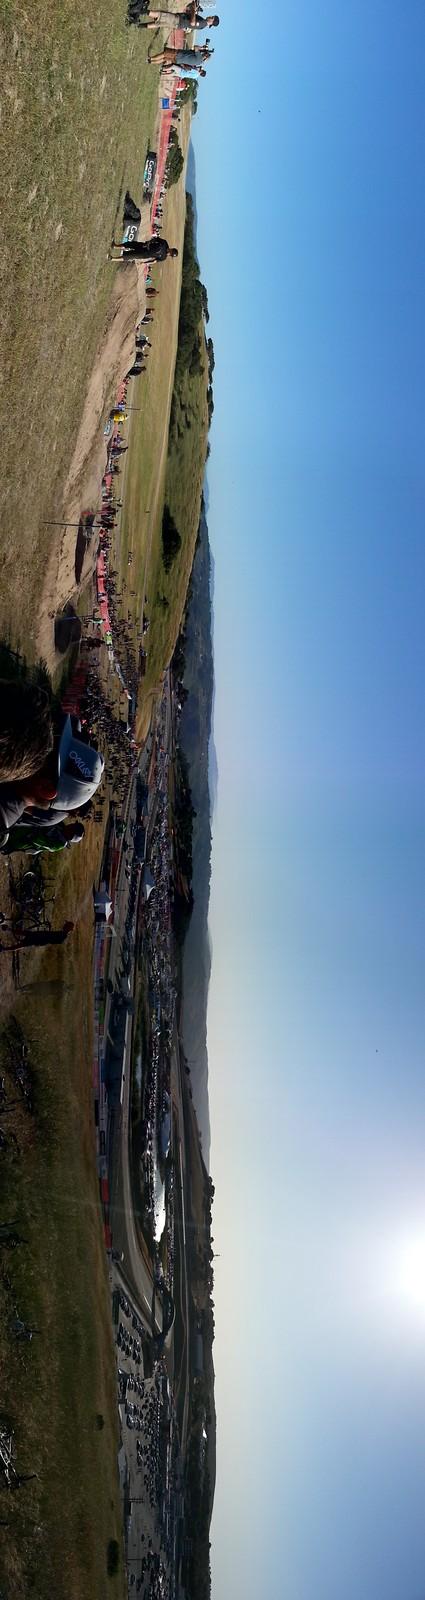 Dual Slalom Sea Otter Panorama! - djames - Mountain Biking Pictures - Vital MTB